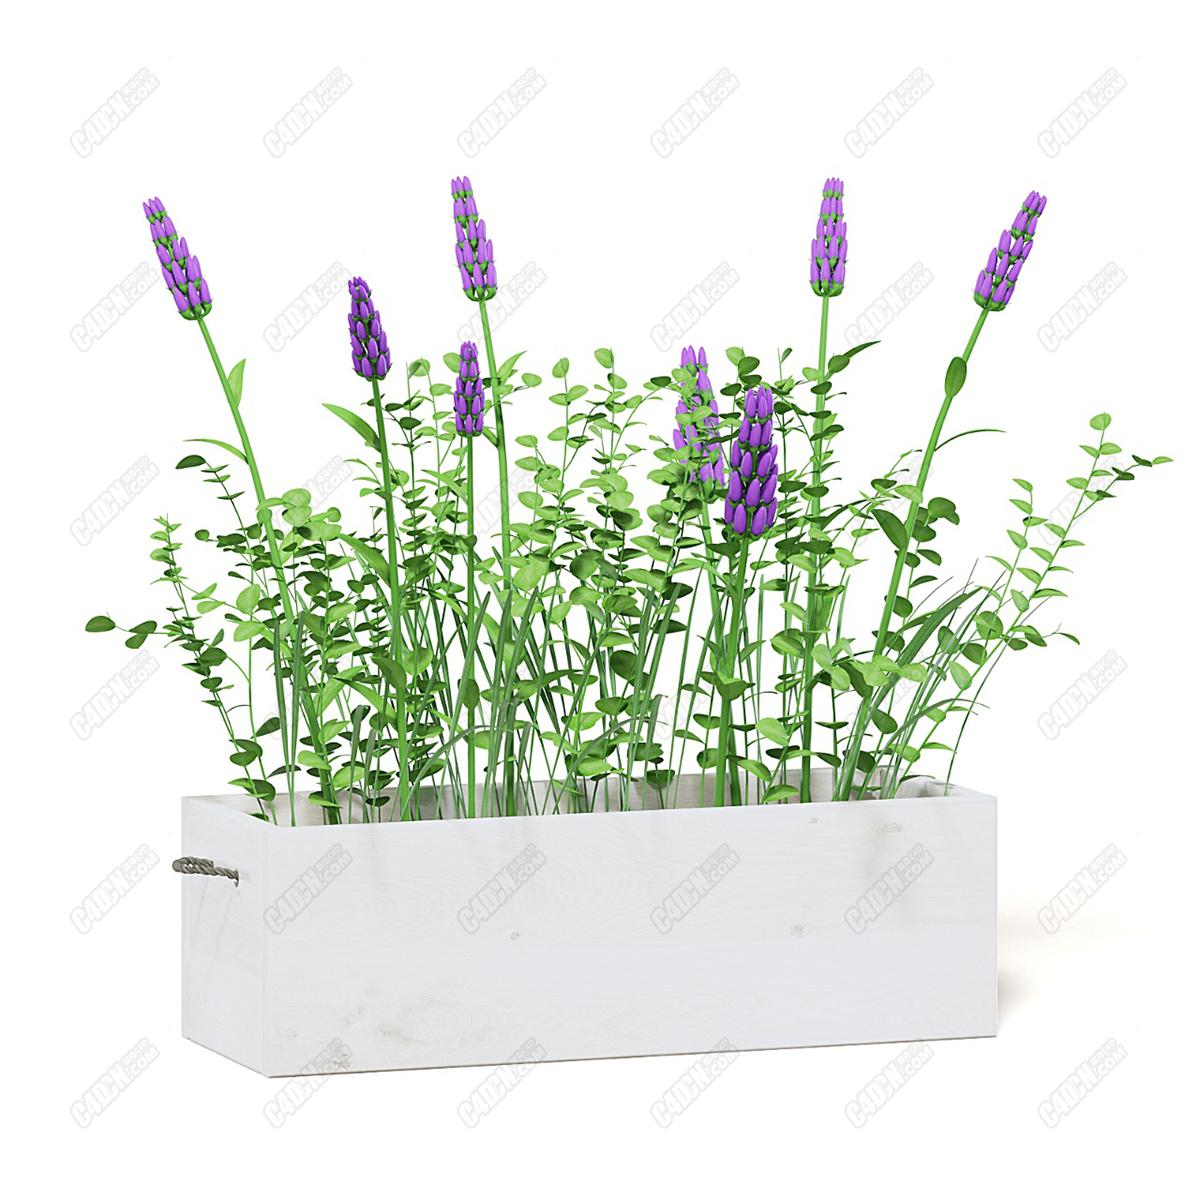 C4D紫色花朵插花艺术盆栽模型